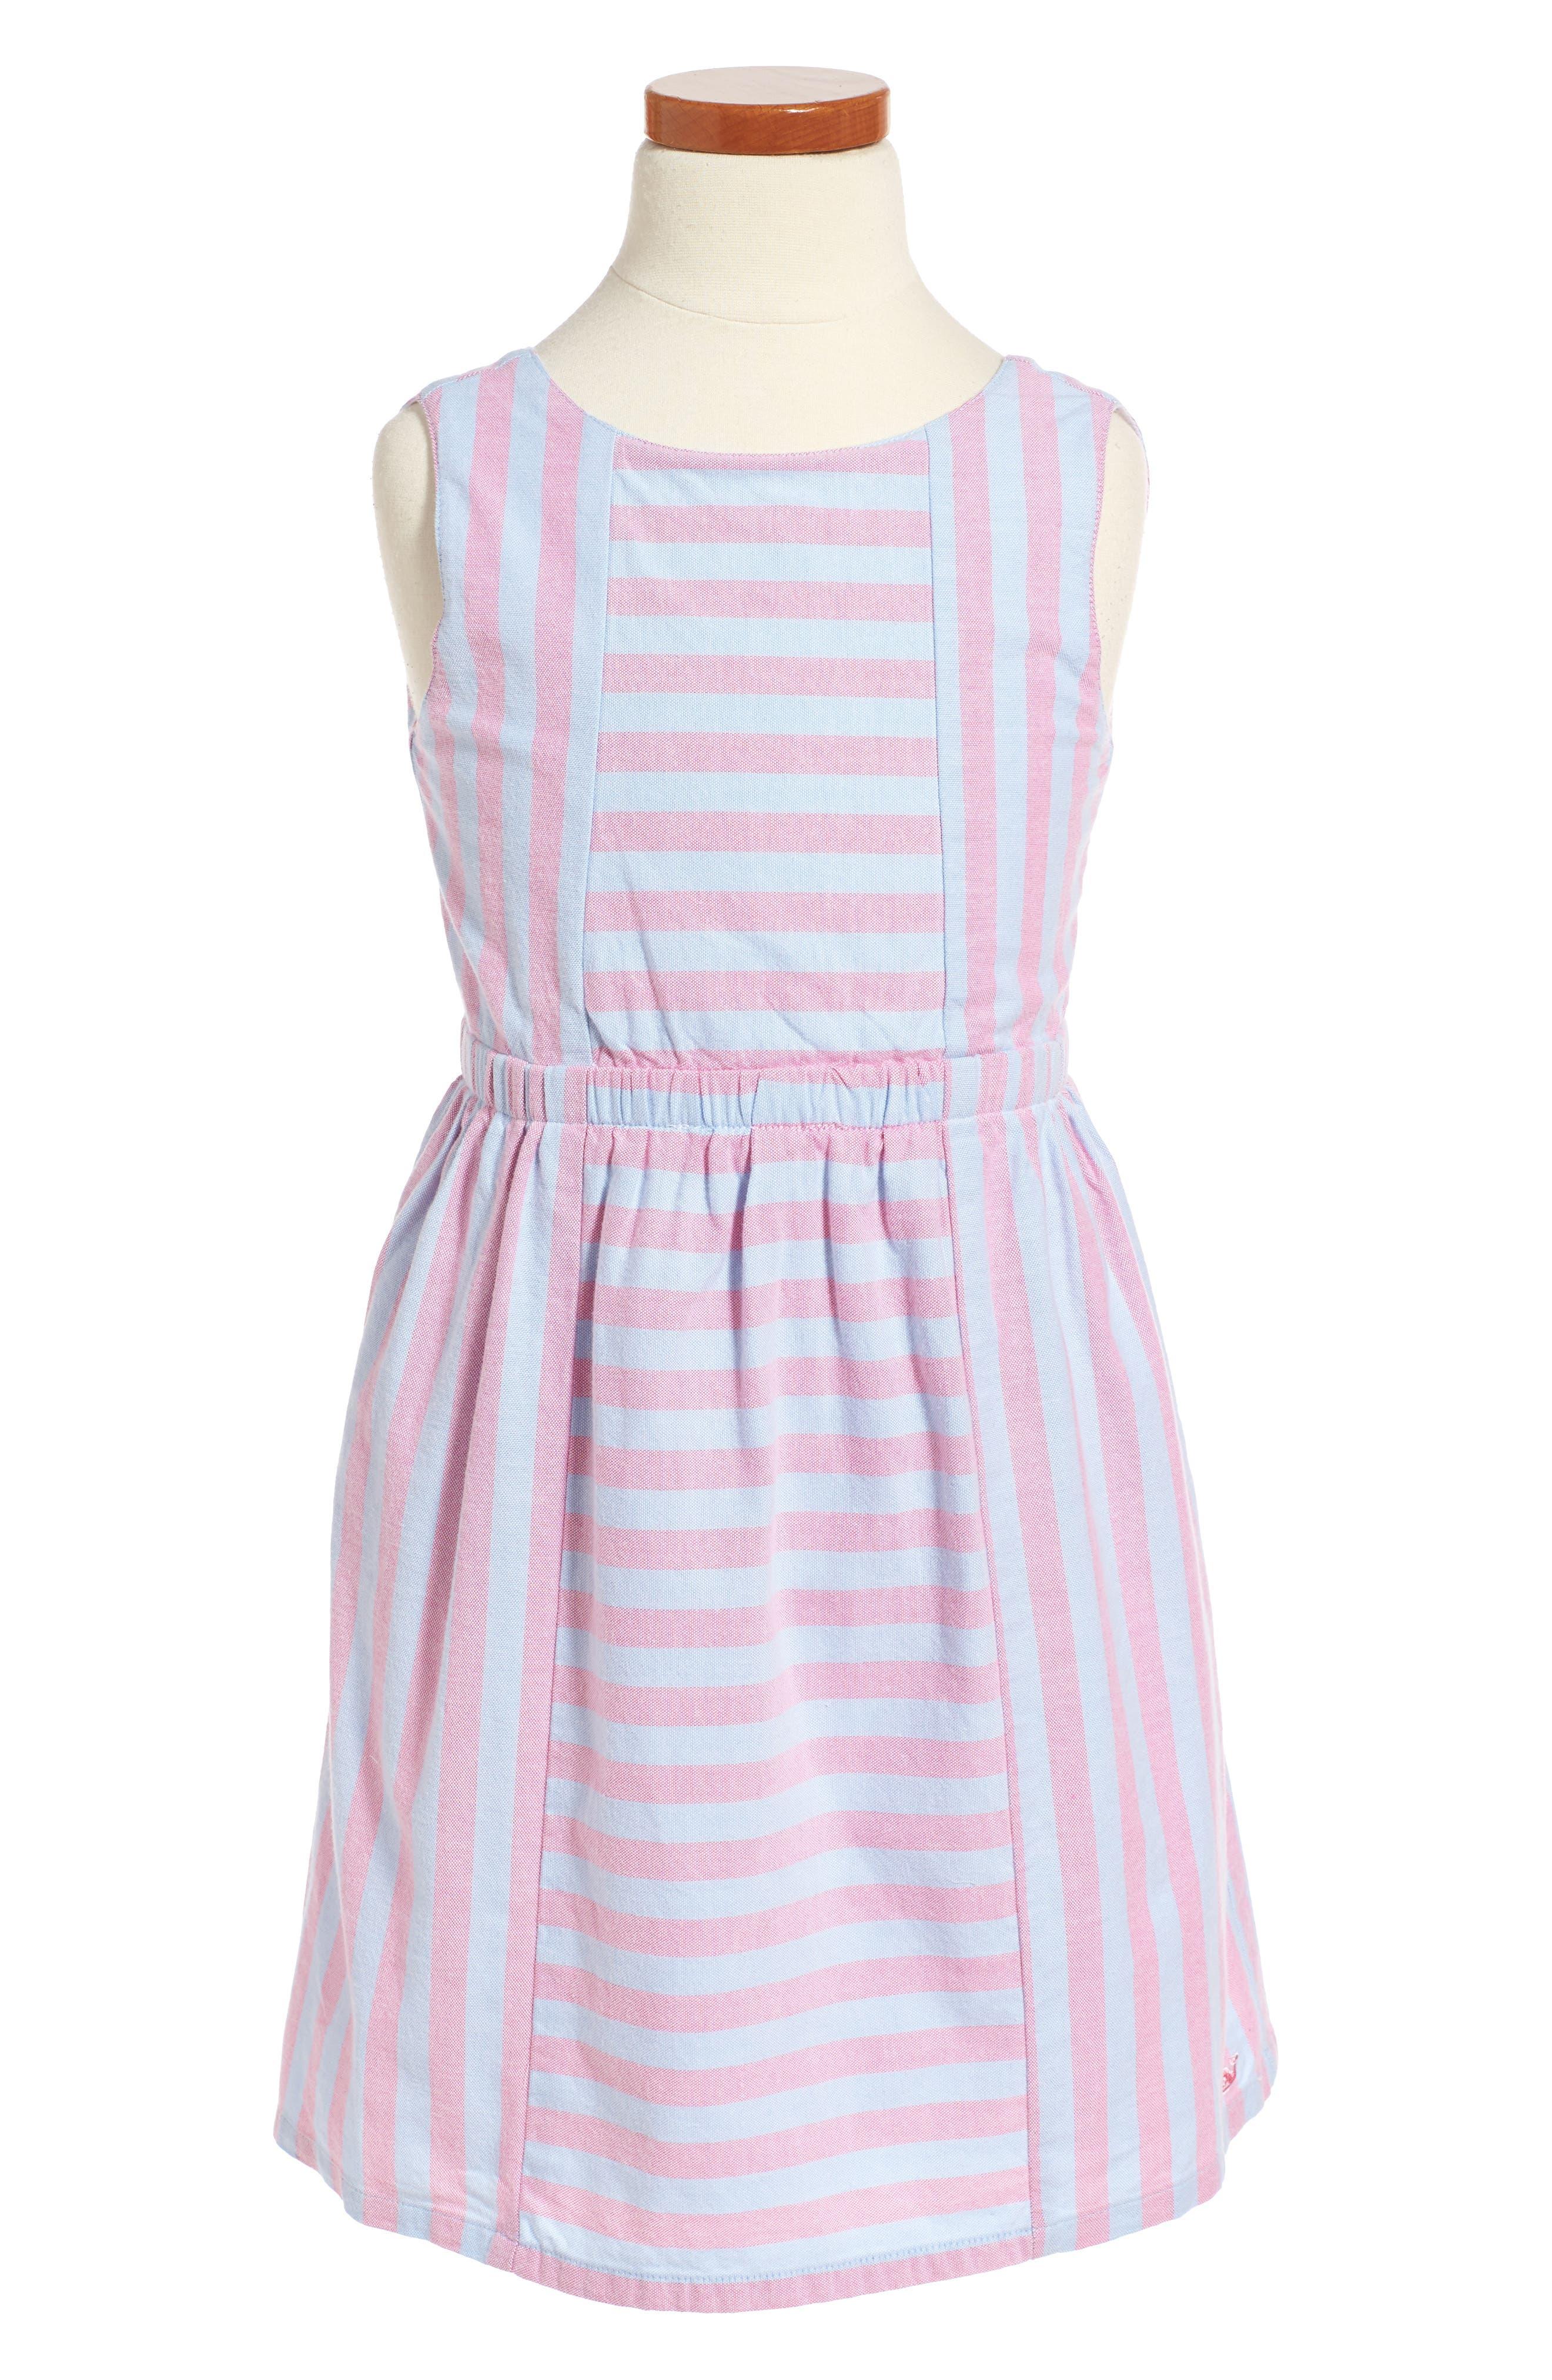 Coastside Stripe Dress,                         Main,                         color, 654